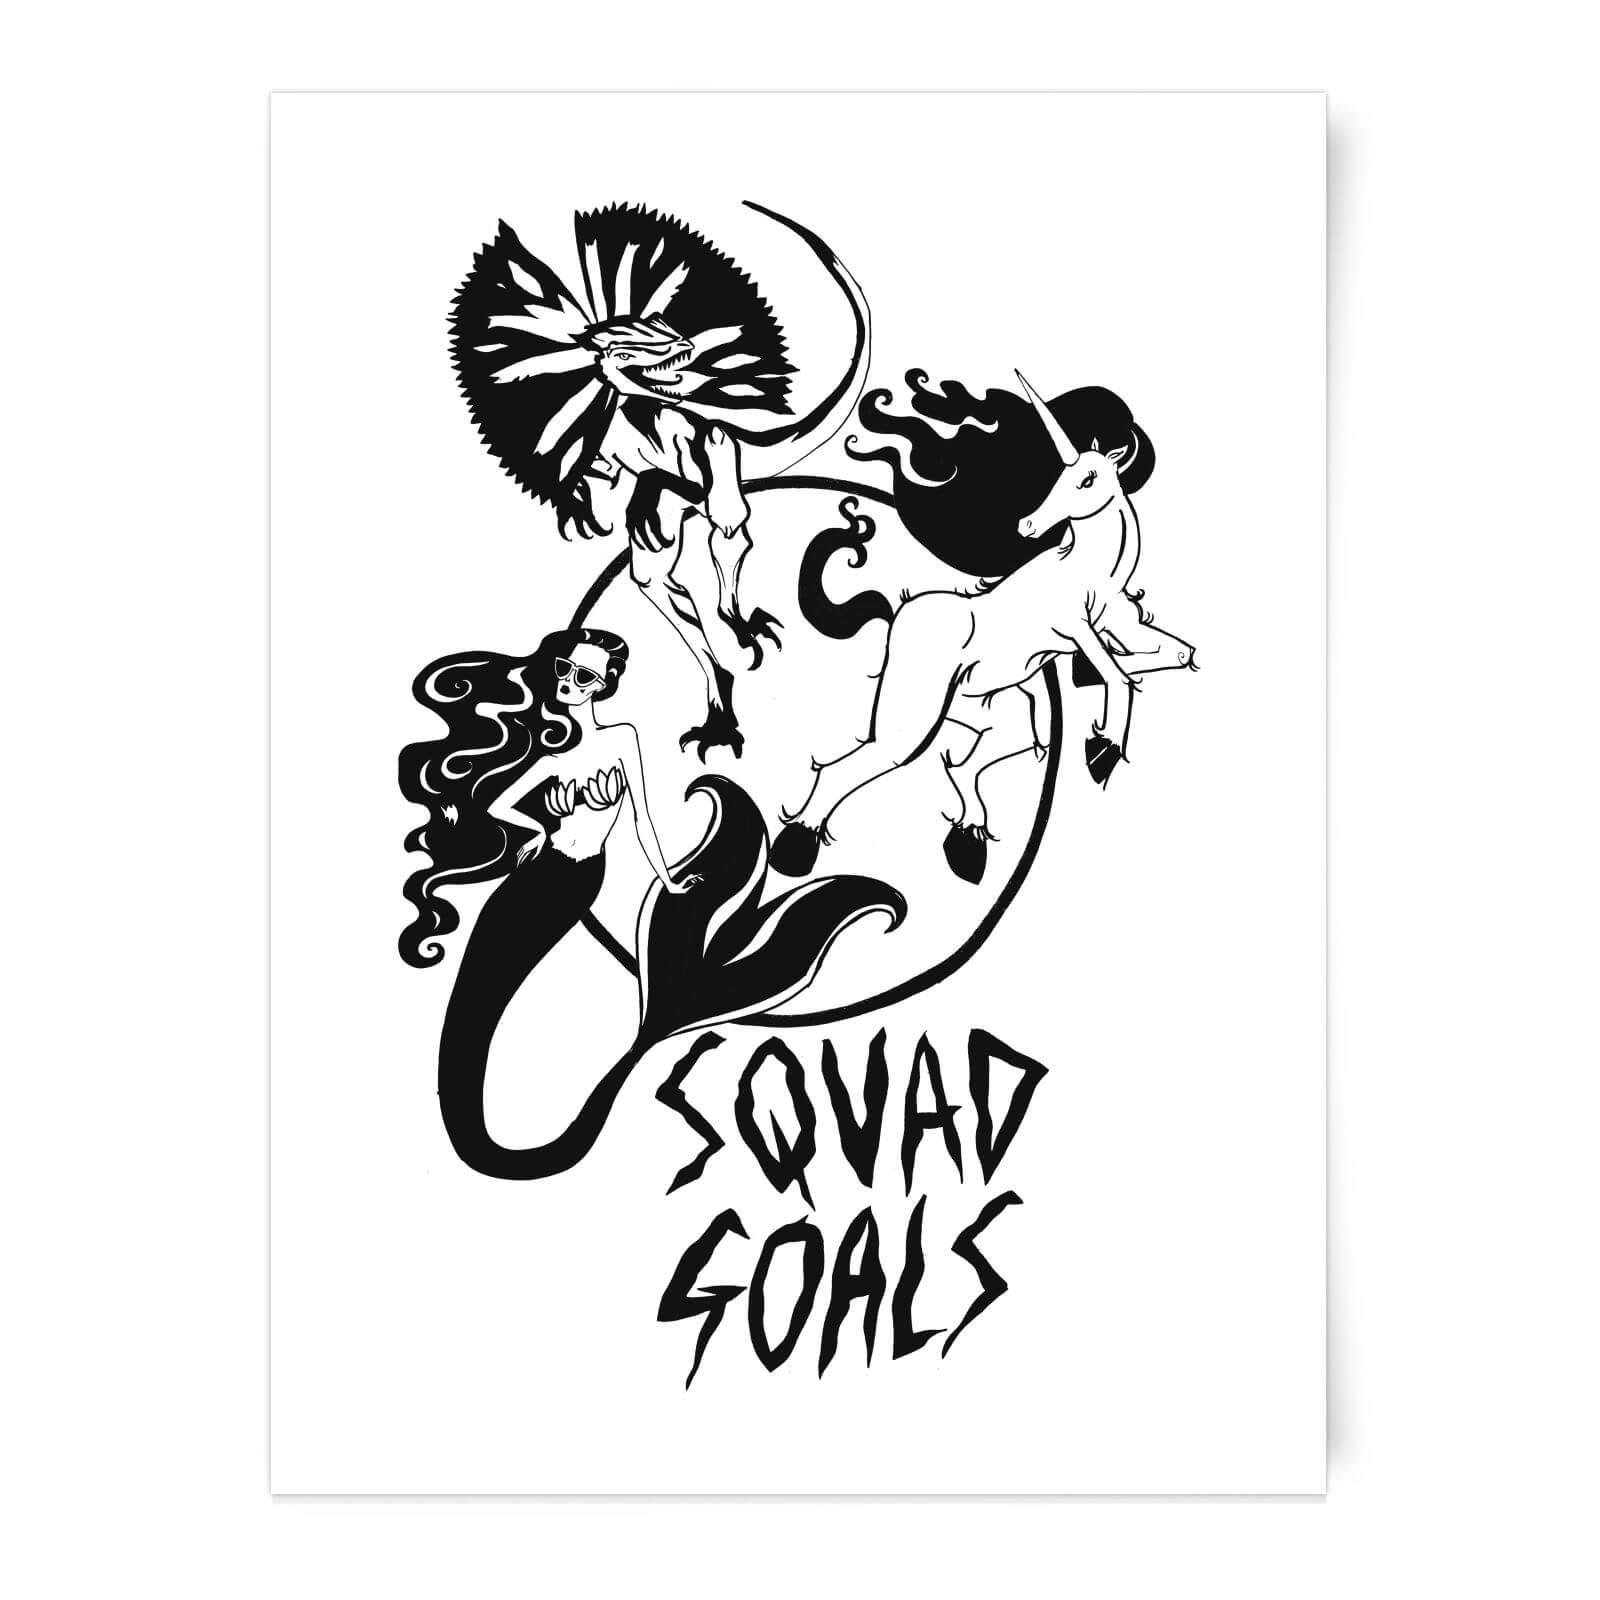 1600x1600 Rock On Ruby Mermaid, Unicorn And Dinosaur Squad Goals Art Print